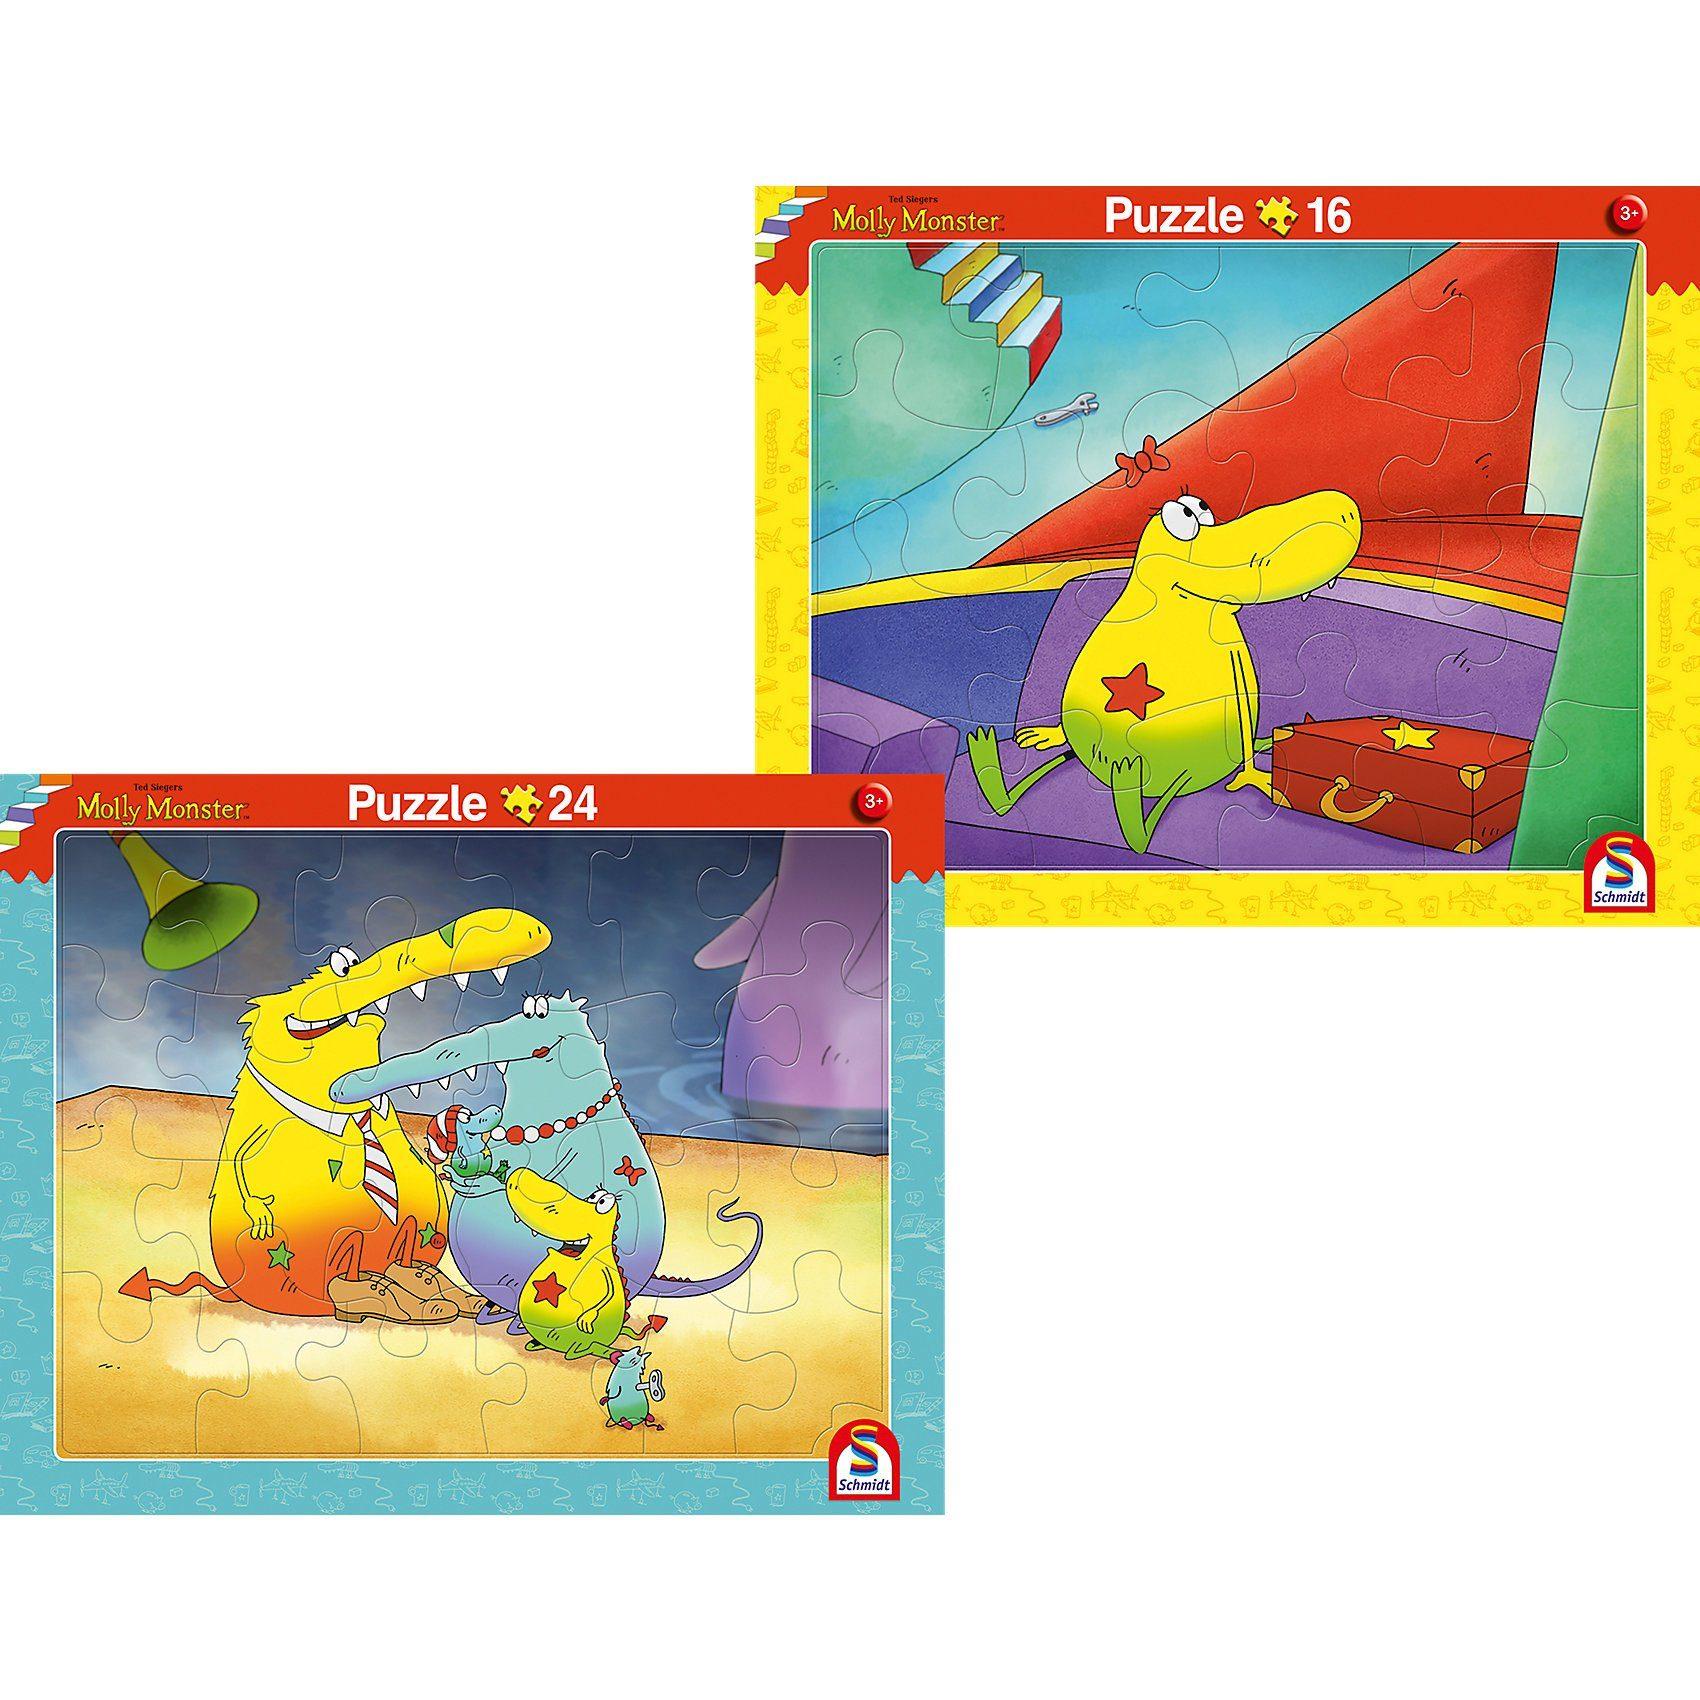 Schmidt Spiele 2er Set Rahmenpuzzle 16 Teile/24 Teile Molly Monster